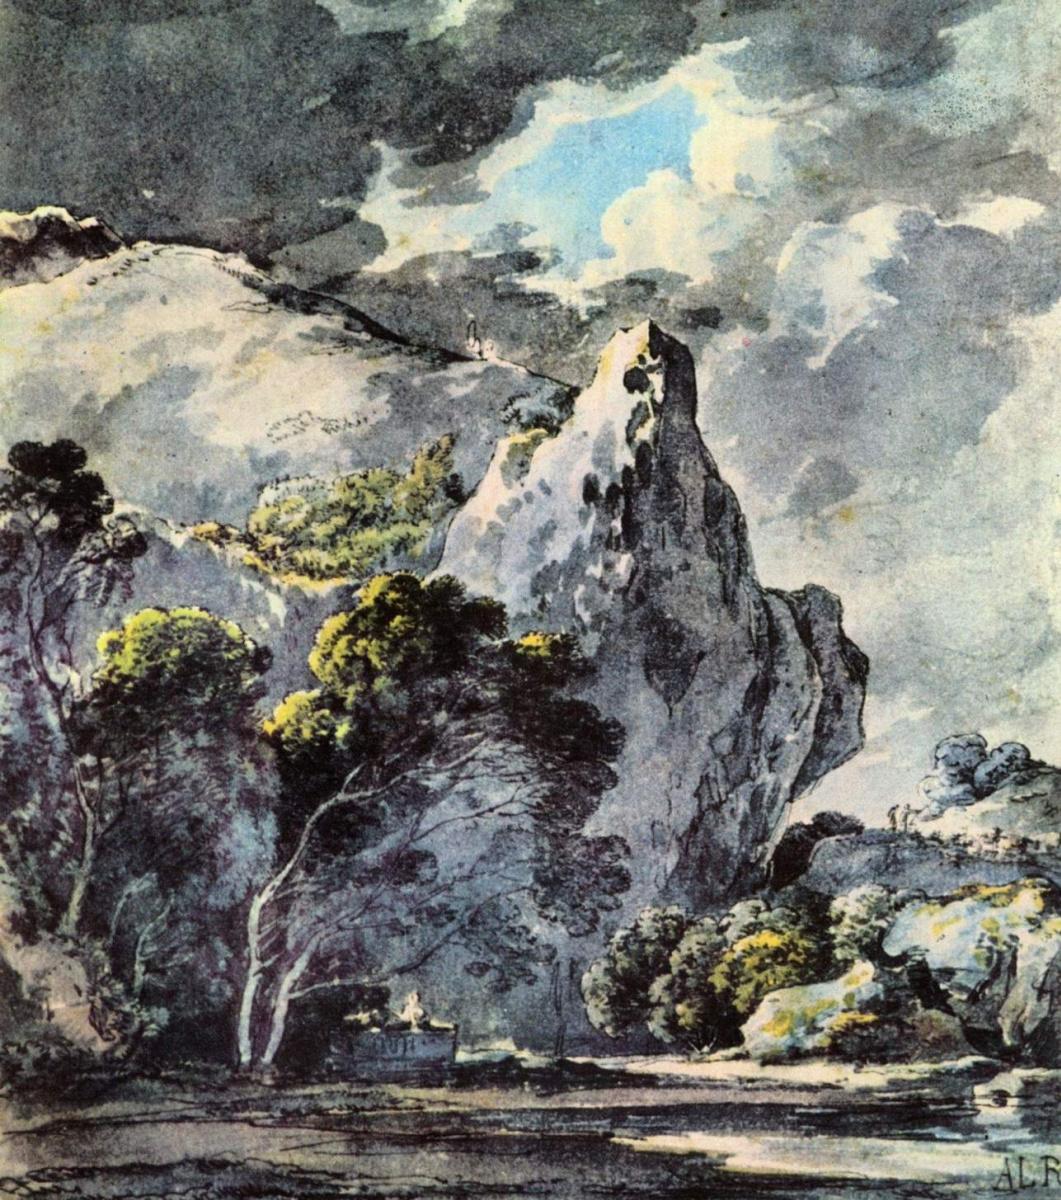 Адриан Людвиг Рихтер. Пейзаж со скалой